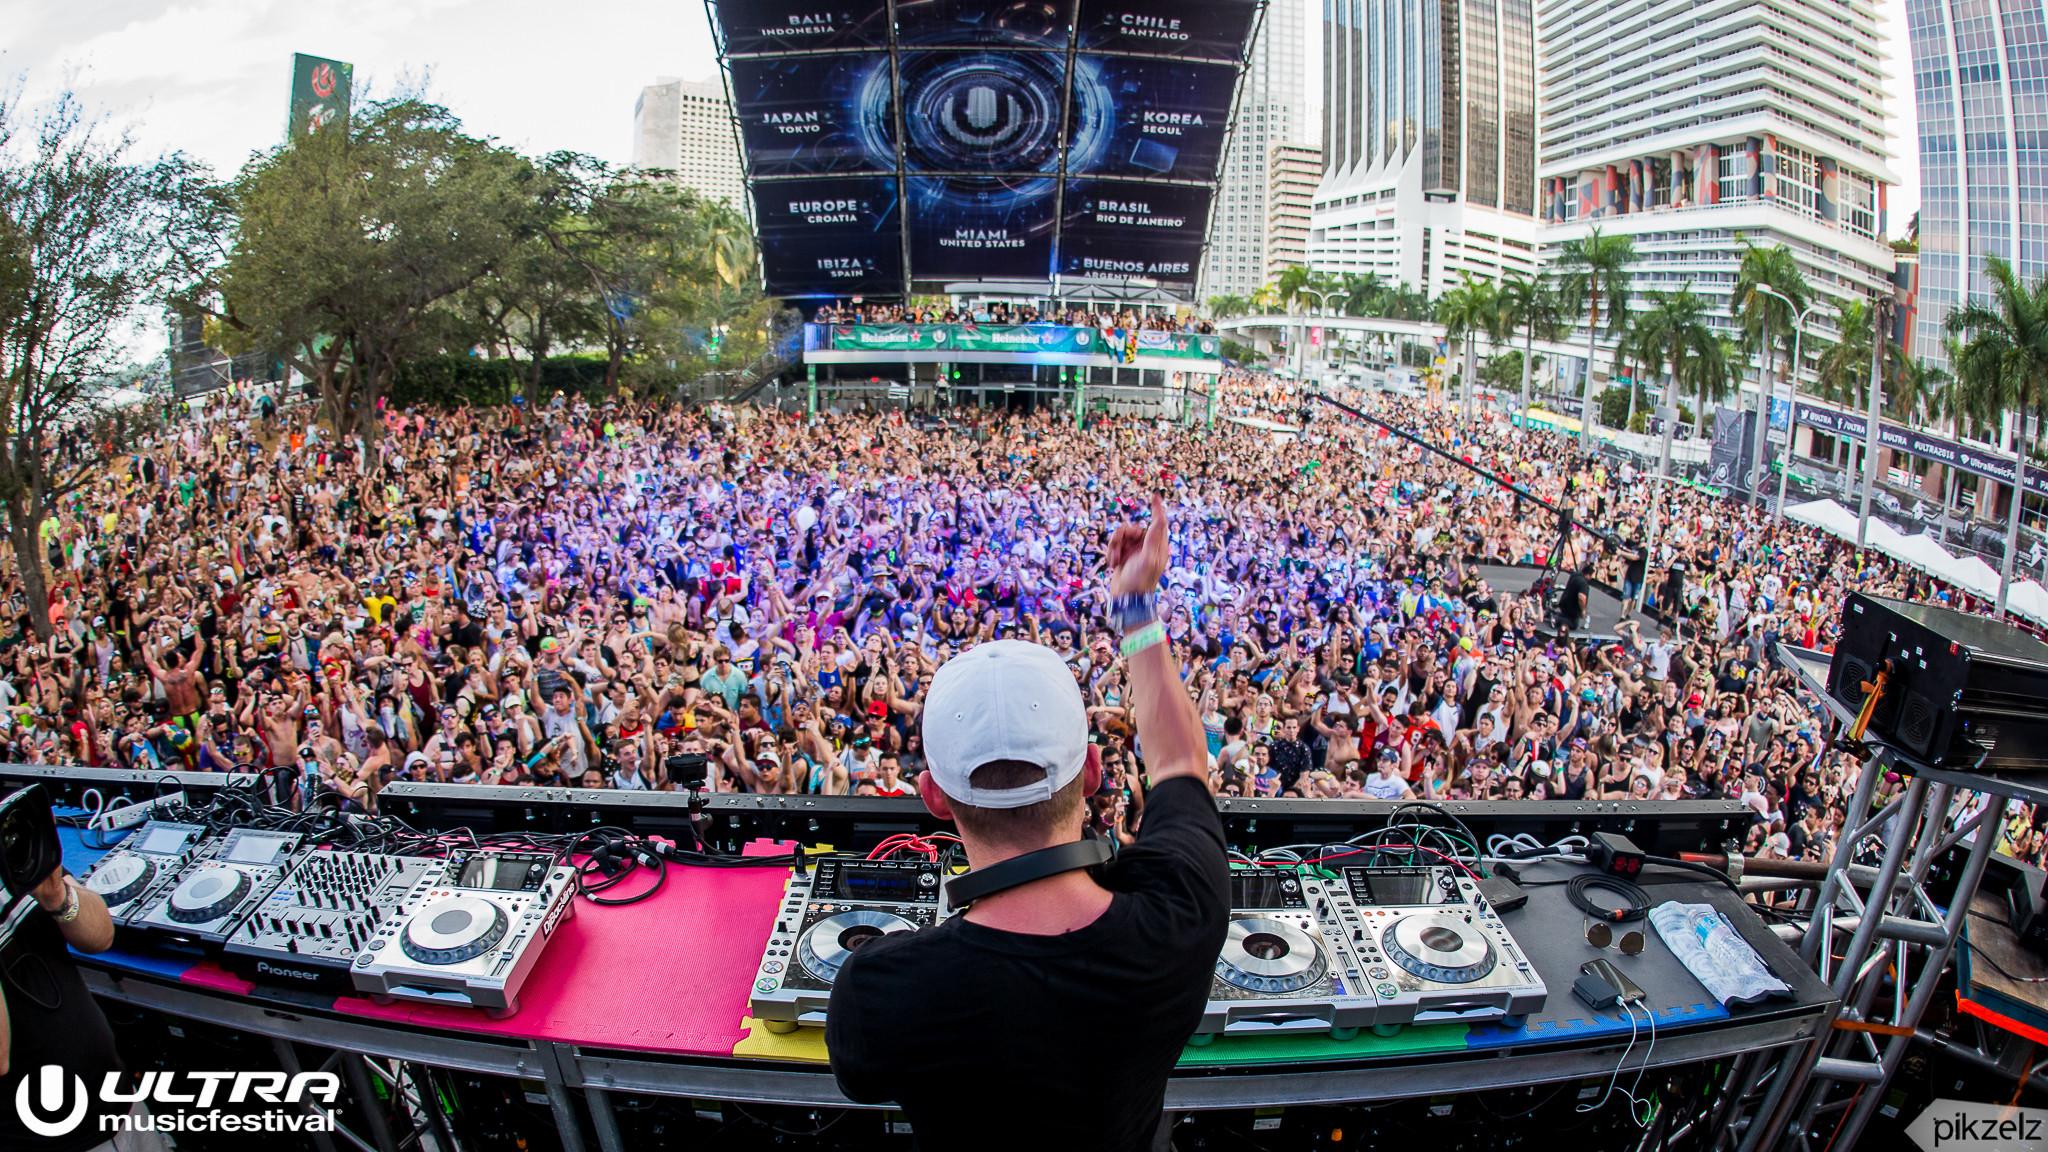 Pikzelz for Ultra Music Festival 2